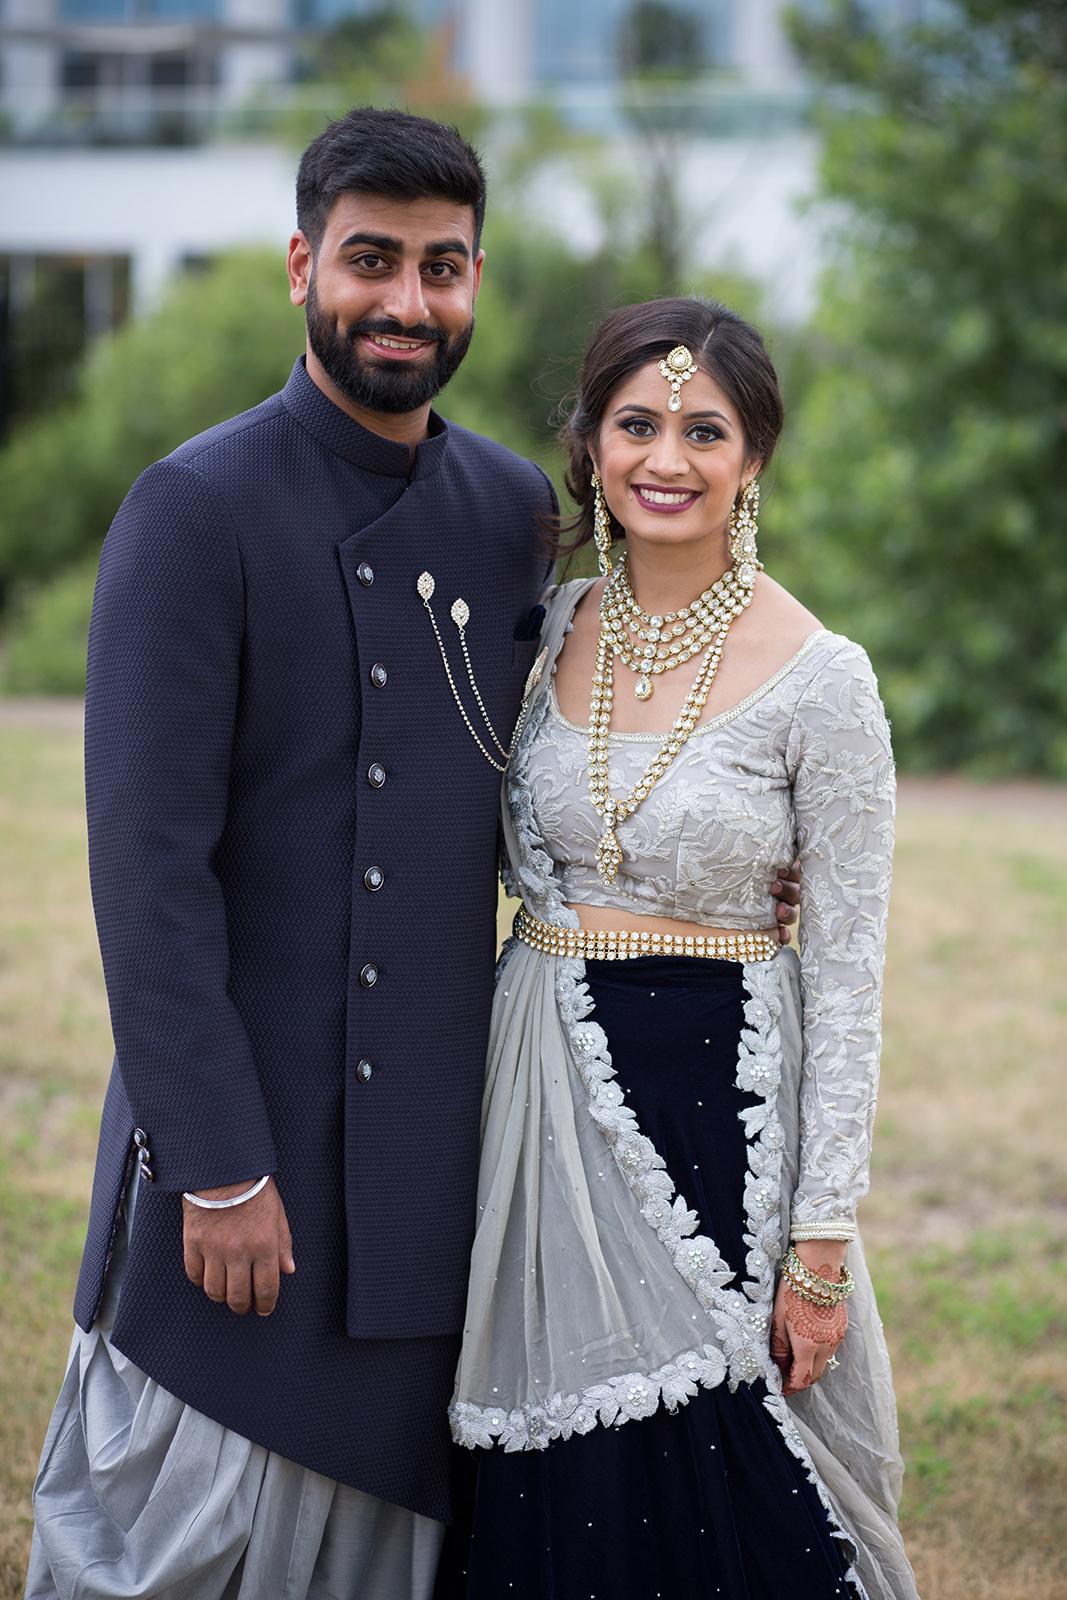 Le Cape Weddings - Rimi and Rohun - Garba Sneak Peek-2.jpg